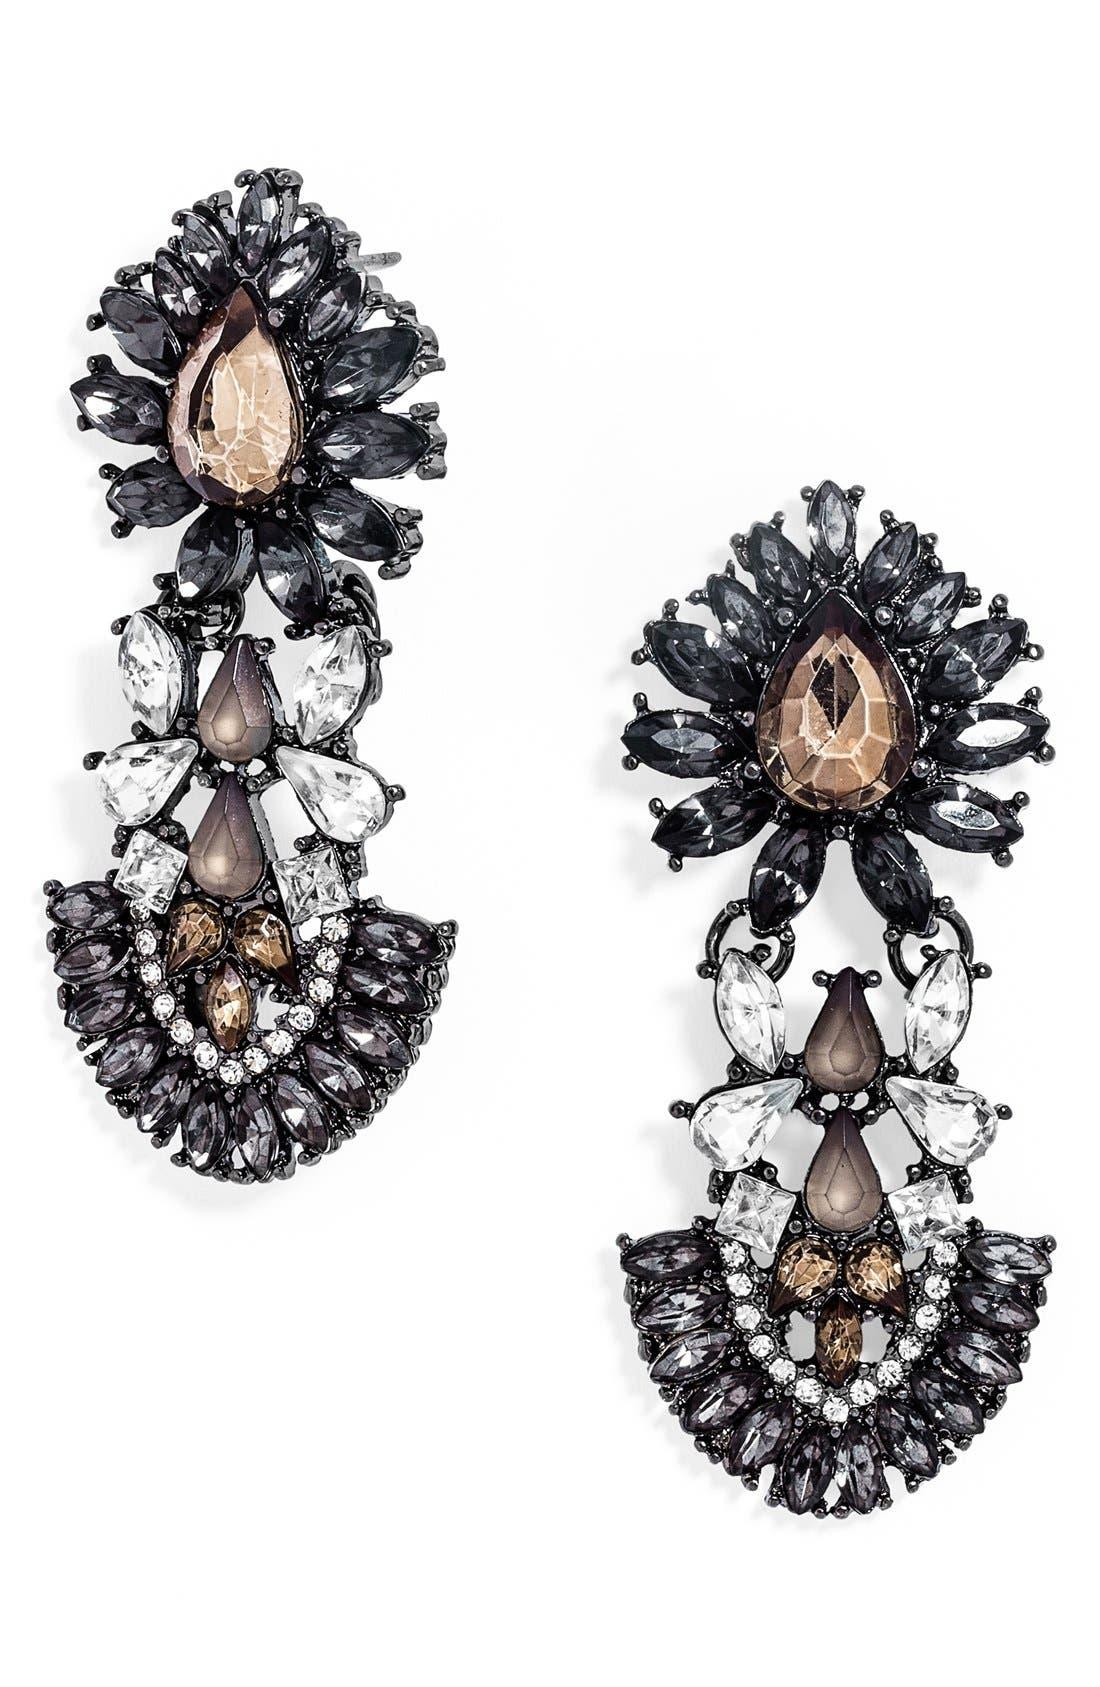 BAUBLEBAR 'Smoky Frank' Drop Earrings, Main, color, 020